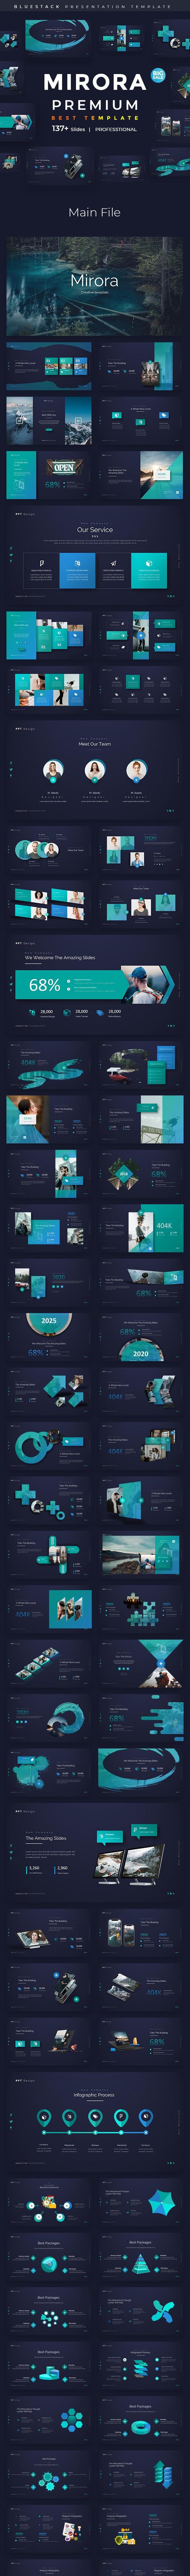 Mirora Premium Keynote Template - Creative Keynote Templates